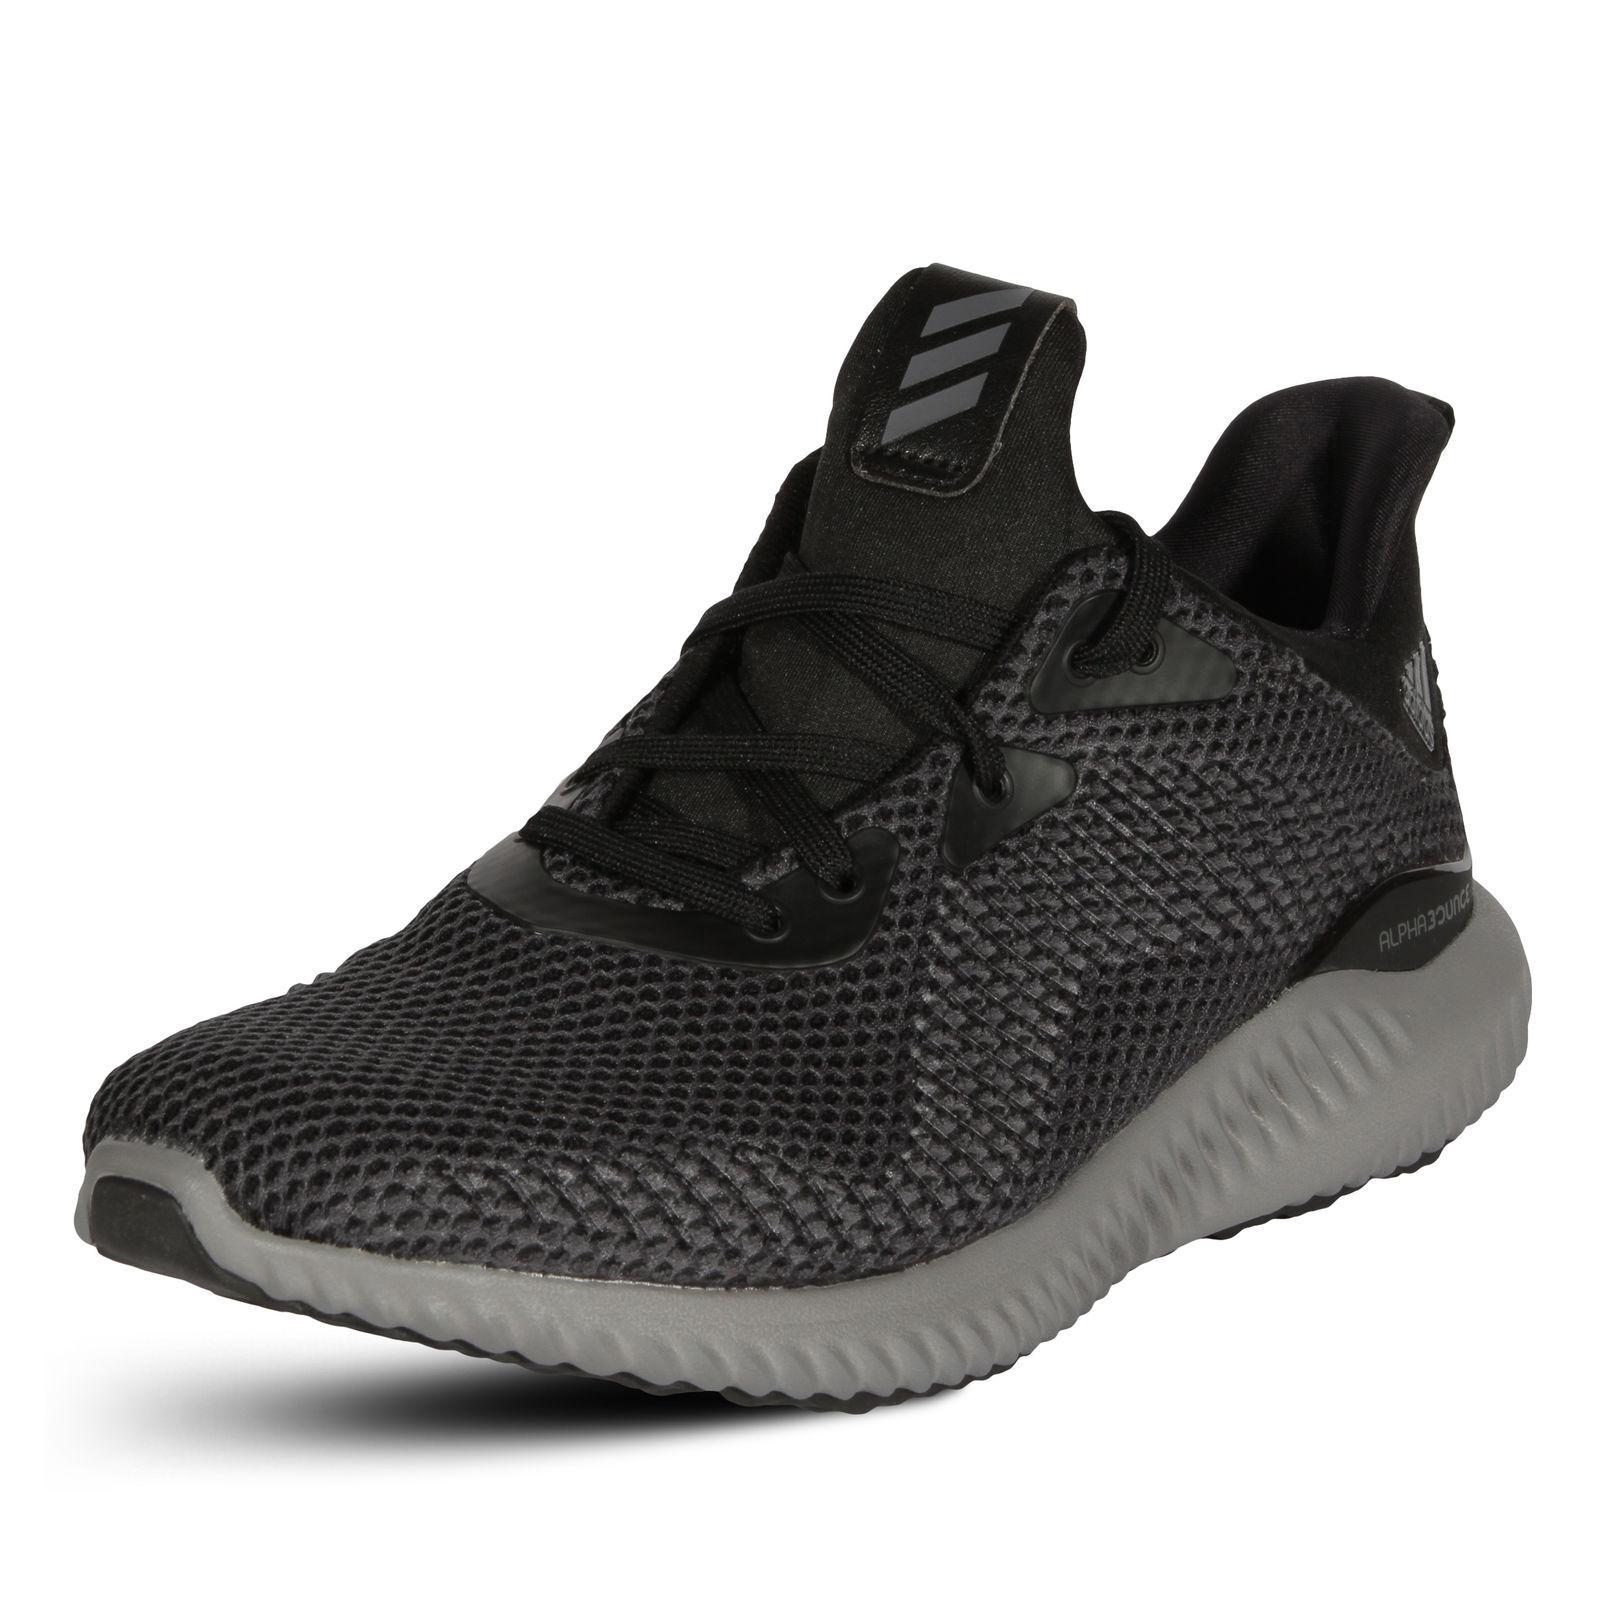 Neu Adidas DAMEN Alphabounce 1 W Cg5400 Kern black grey Laufschuhe Sneaker